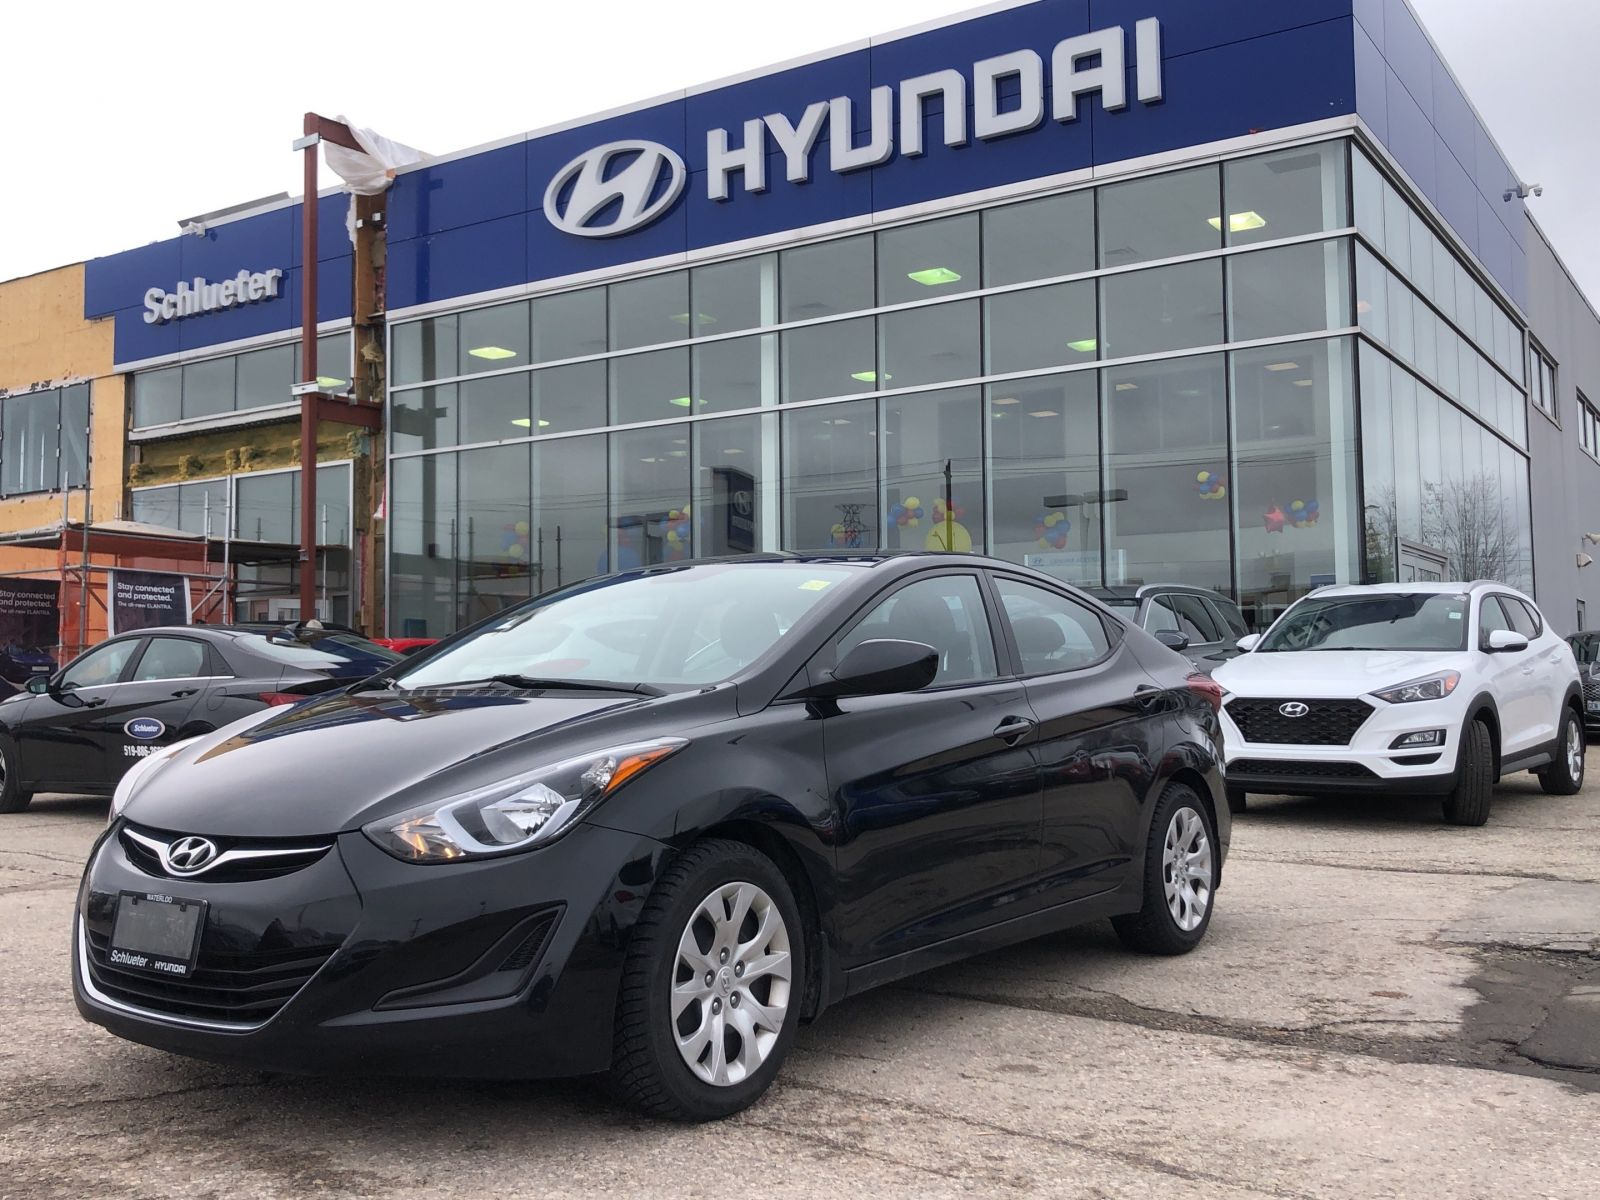 2016 Hyundai Elantra Image